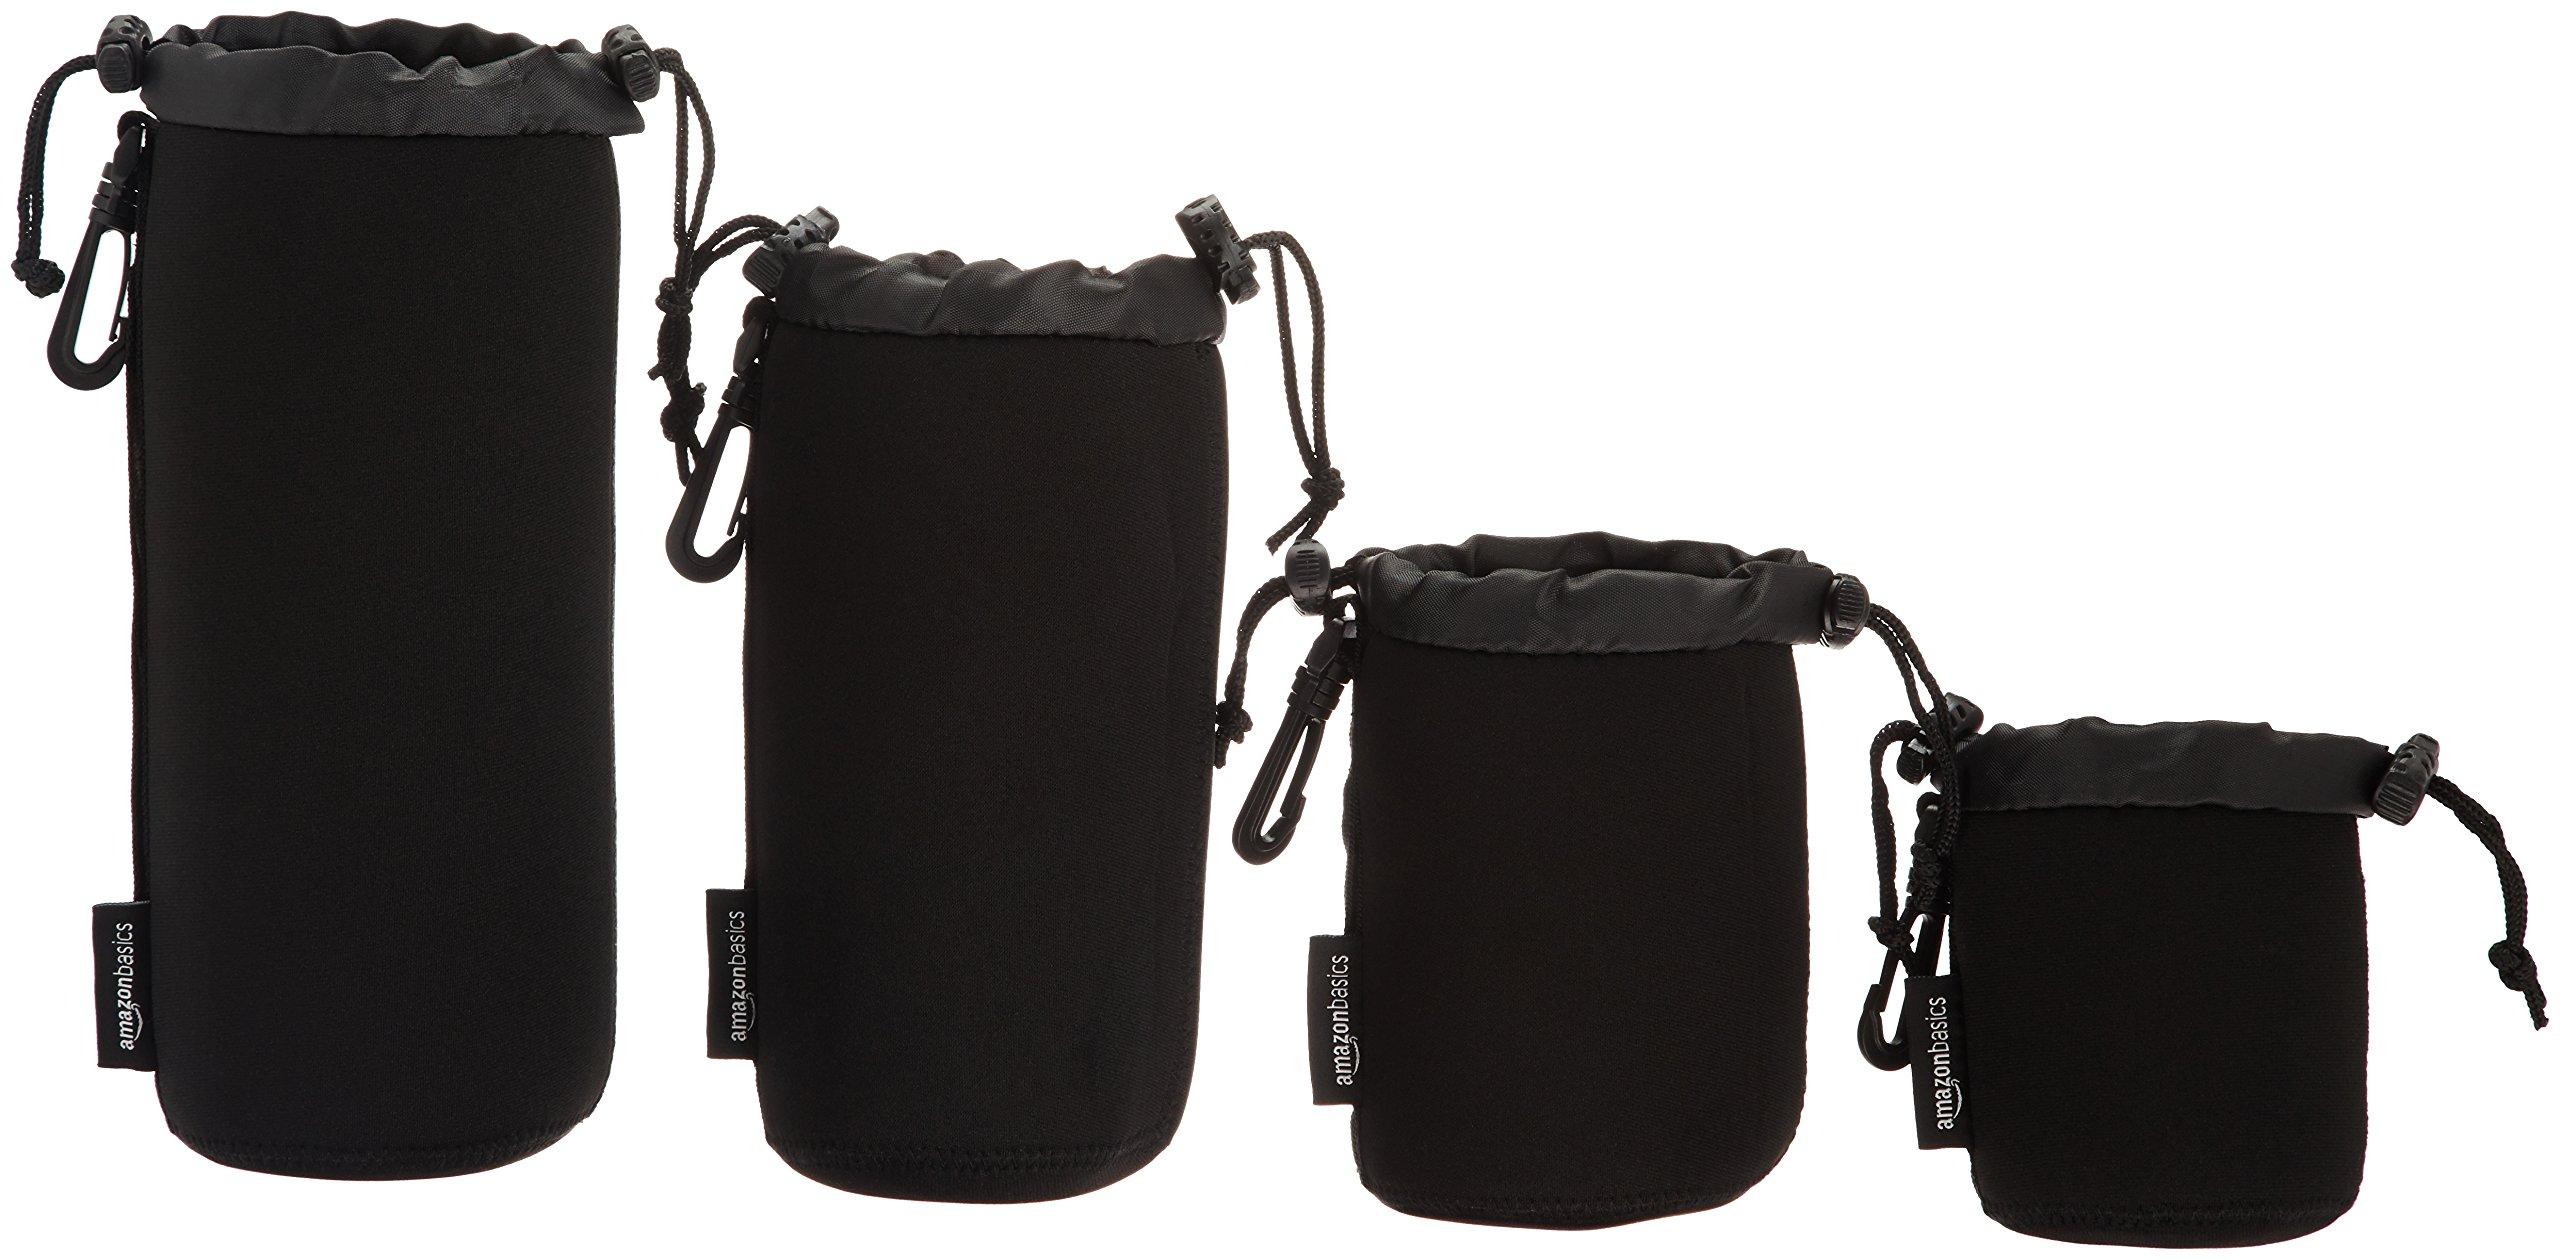 AmazonBasics Water Resistant Neoprene Camera Lens Accessories Protective Case - Set of 4, Black by AmazonBasics